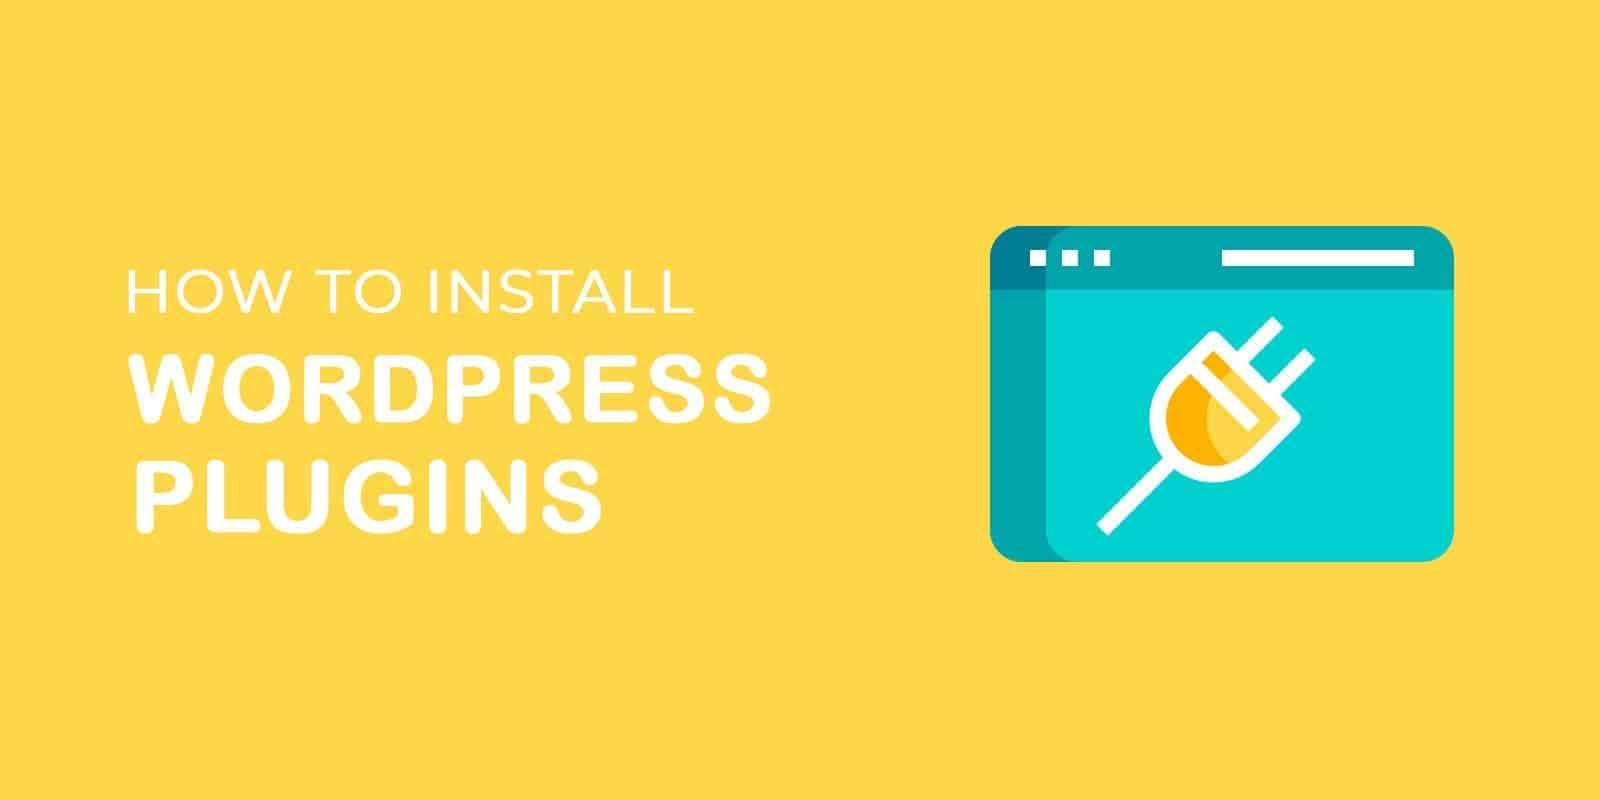 text and image saying install WordPress plugins